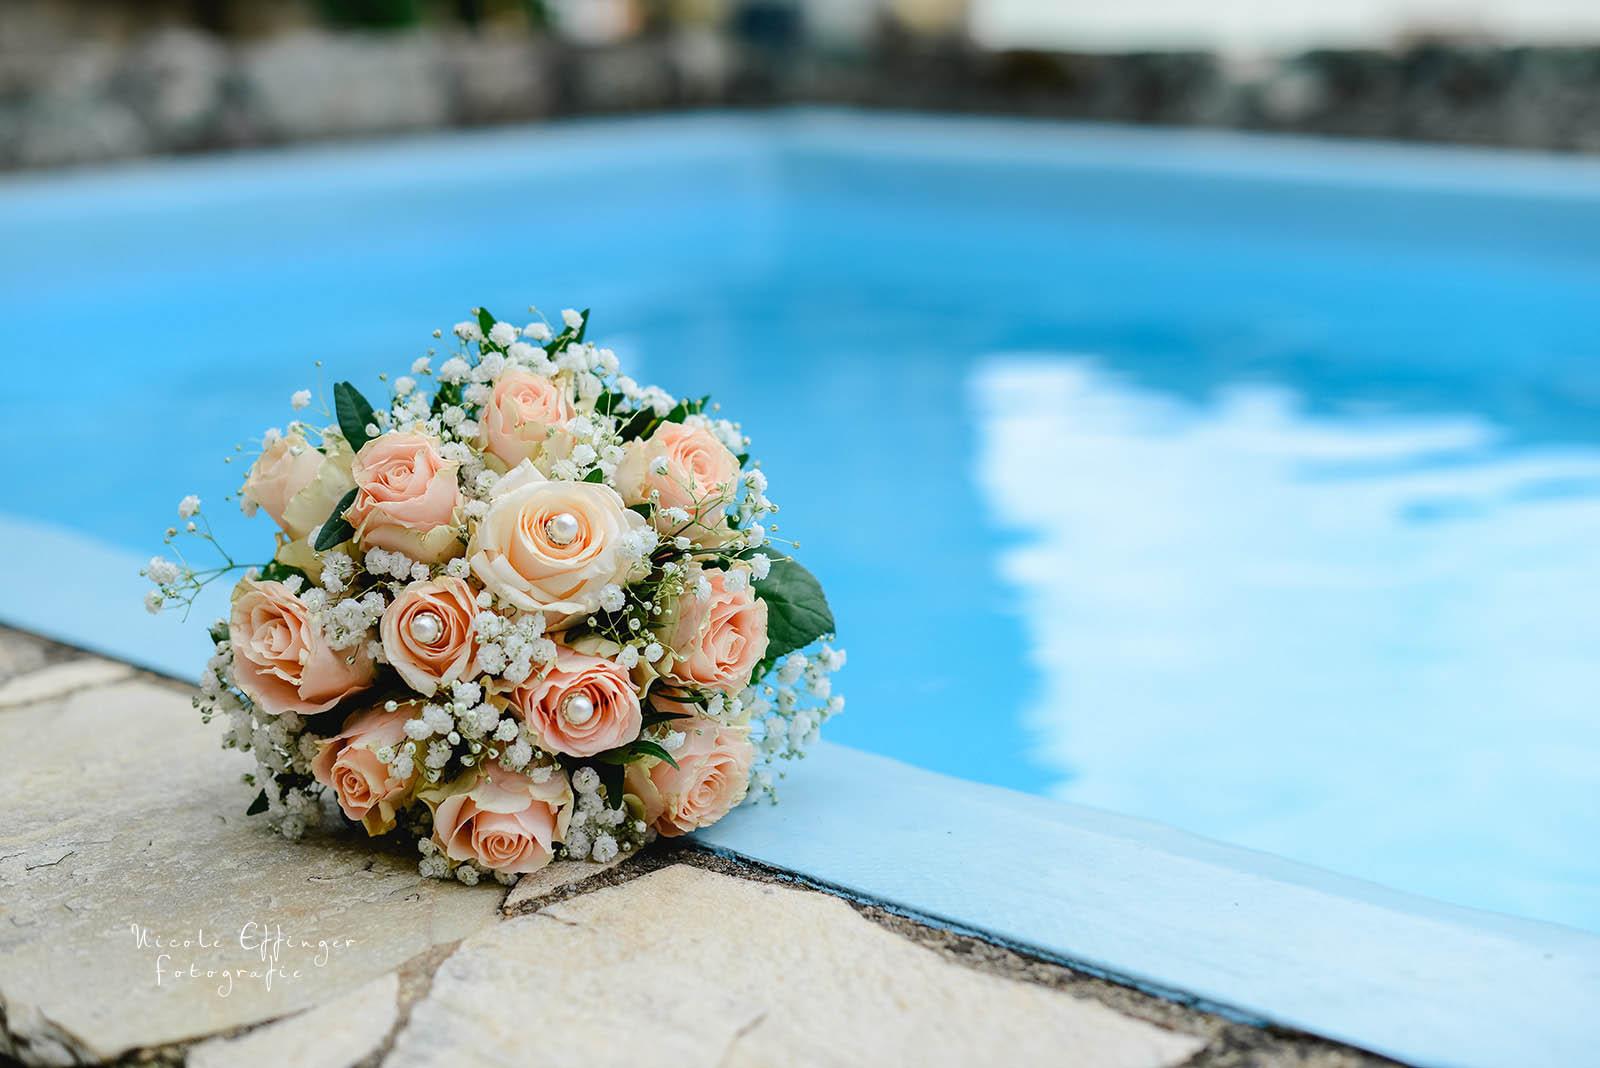 Hochzeitsfotos Fotografin Toskana, Hochzeitsfotos Butzbach 2020